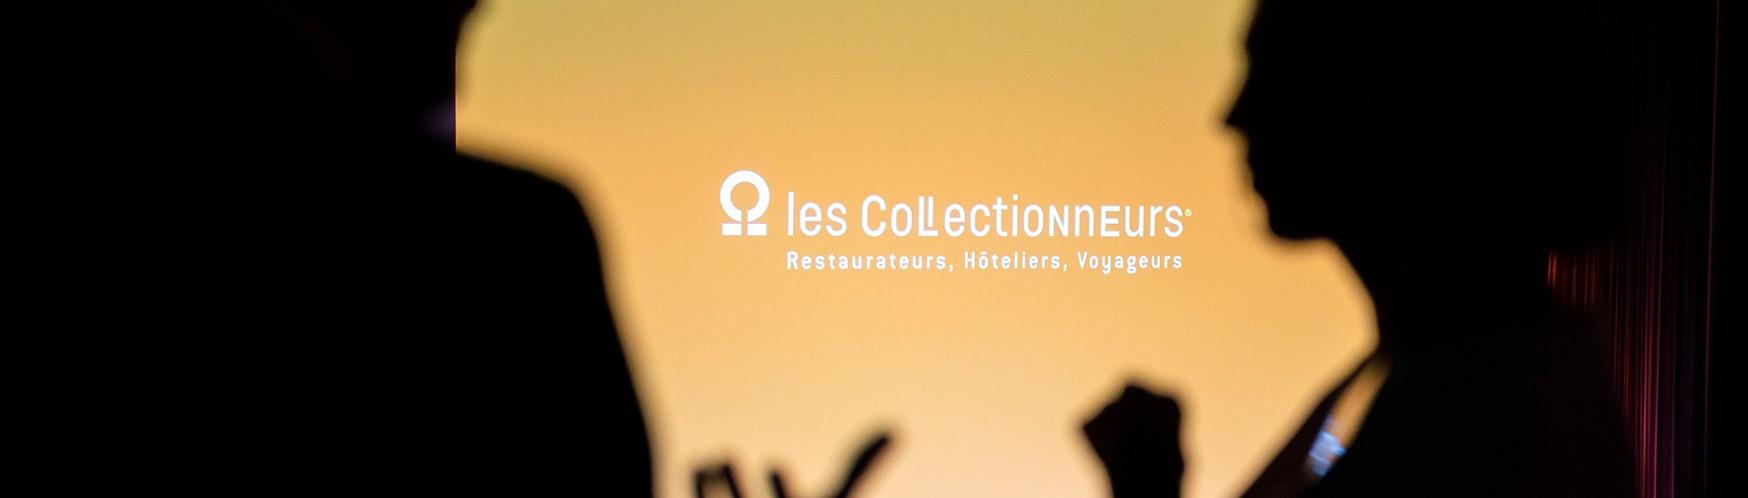 Gala les Collectionneurs 2019 © Julien Mouffron-Gardner